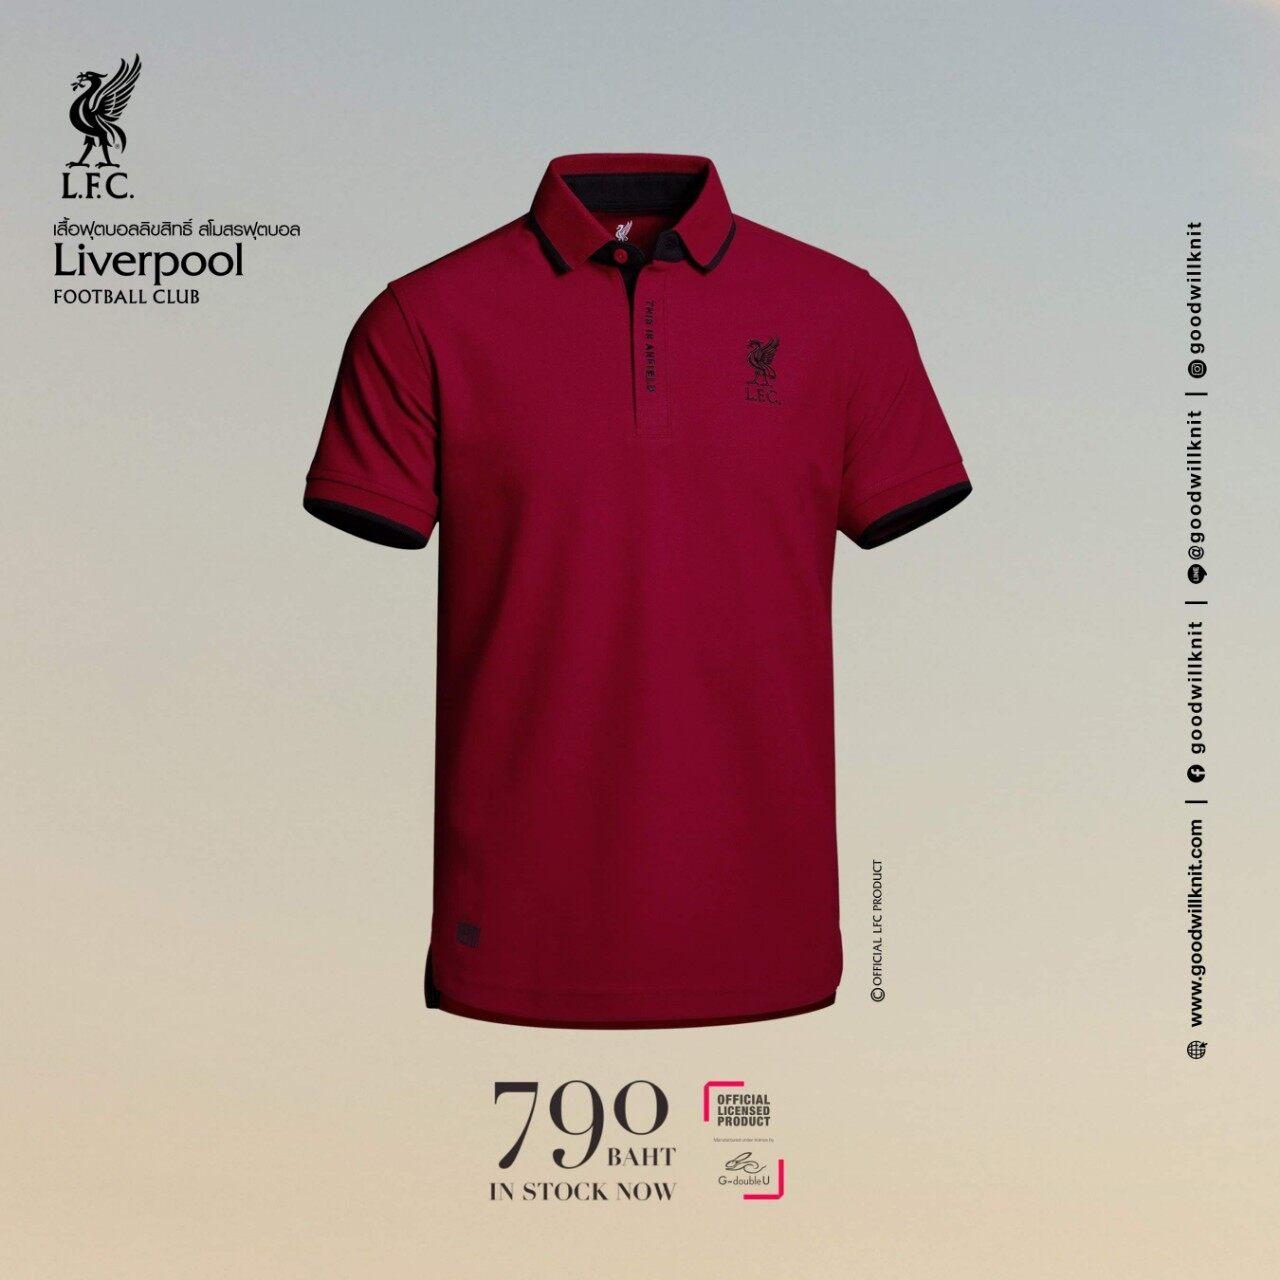 Goodwillknit Liverpool เสื้อลิเวอร์พูล เสื้อโปโล ลิเวอร์พูล ลิขสิทธิ์ C041 มี 3 สี